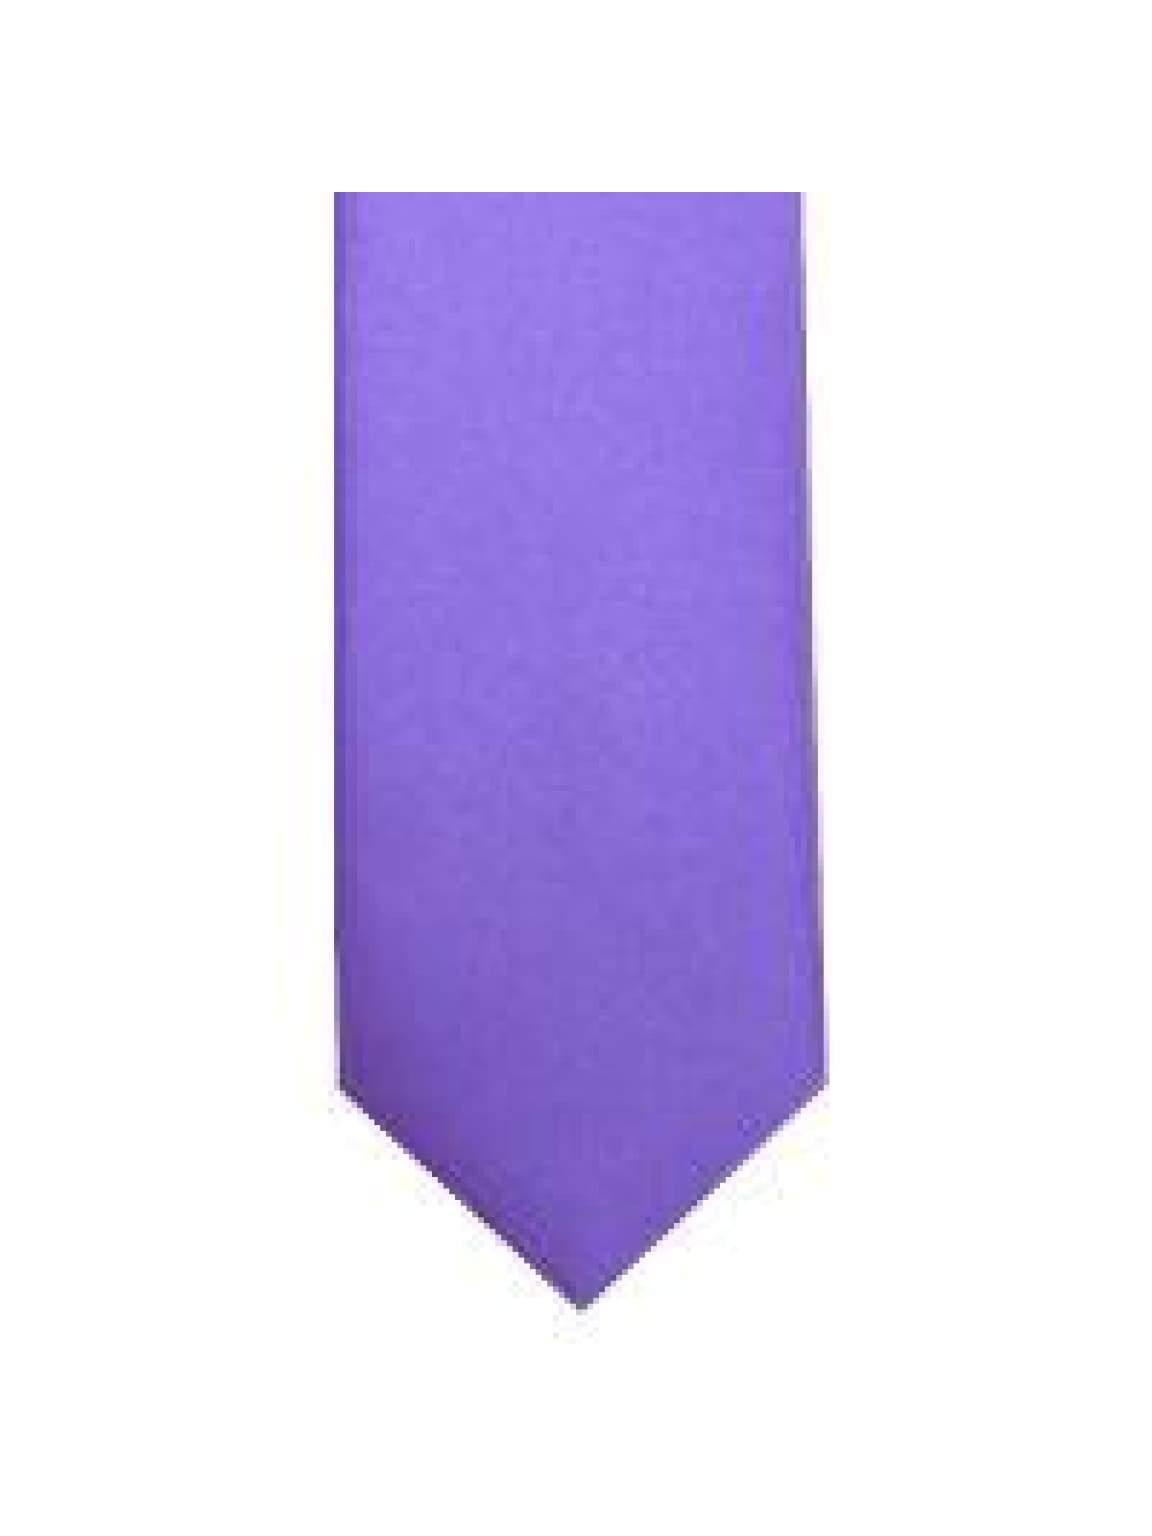 LA Smith Lavender Skinny Weft Satin Tie - Accessories